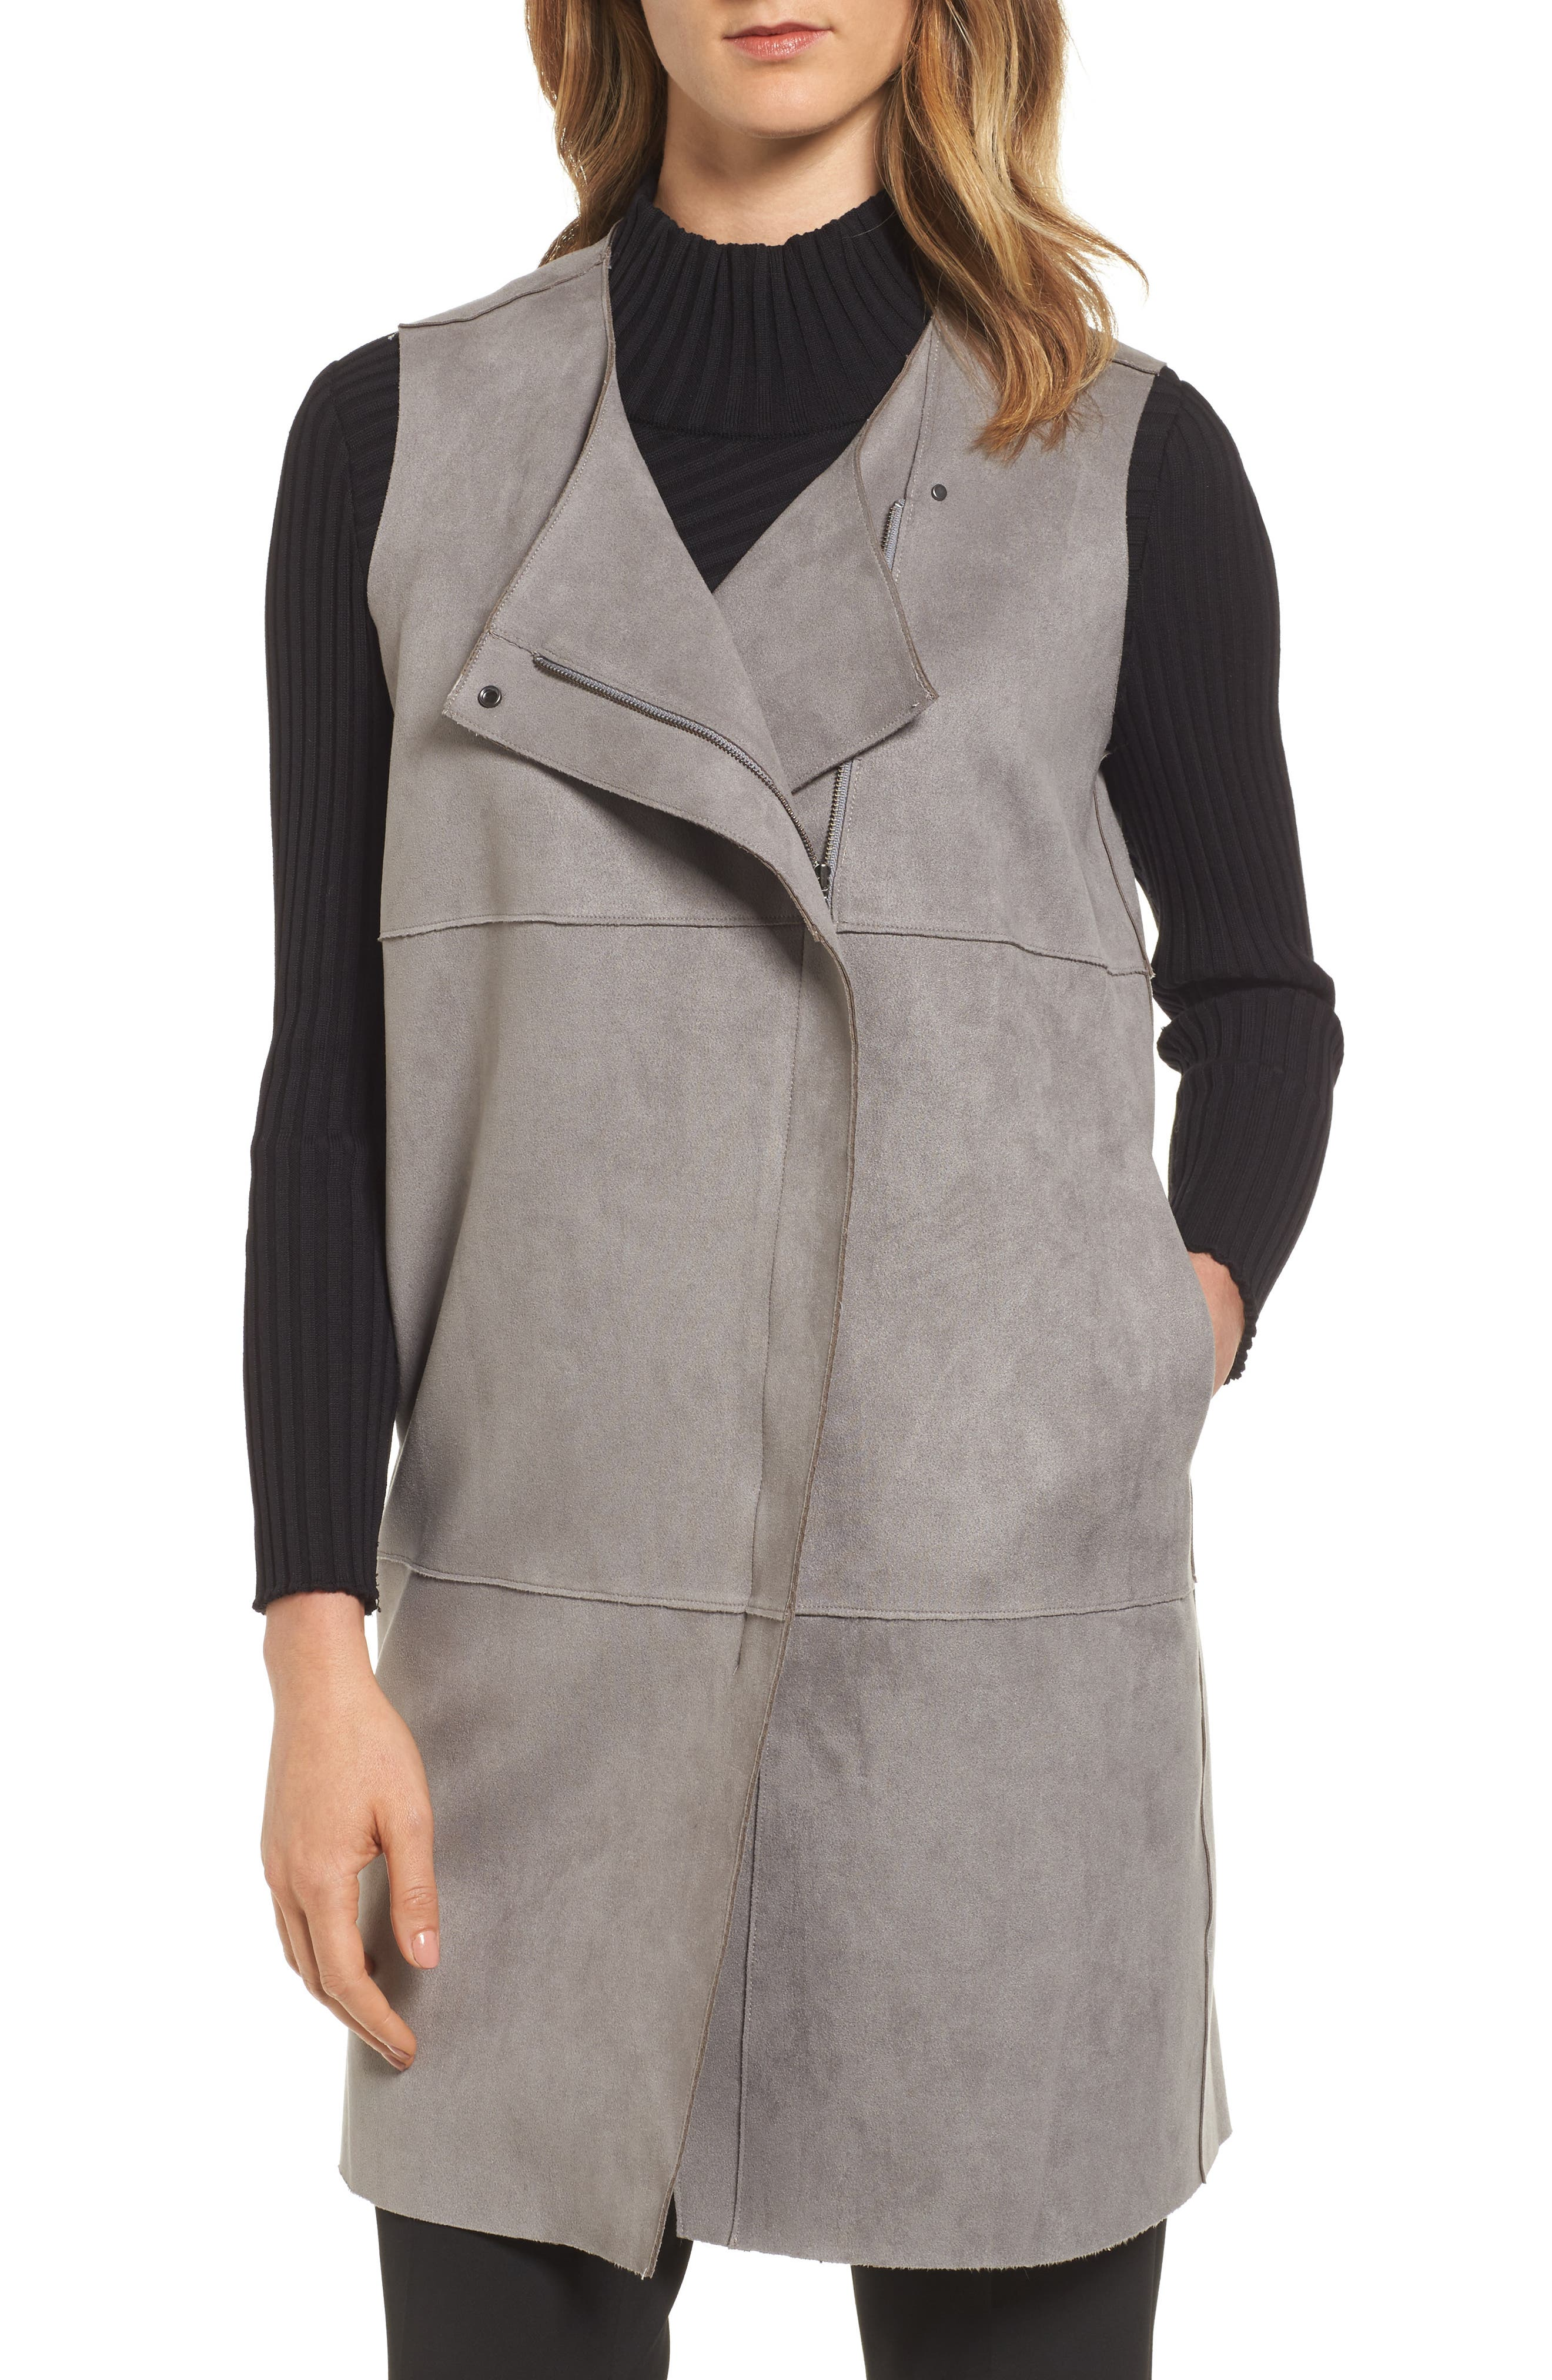 MING WANG Asymmetrical Faux Suede Vest